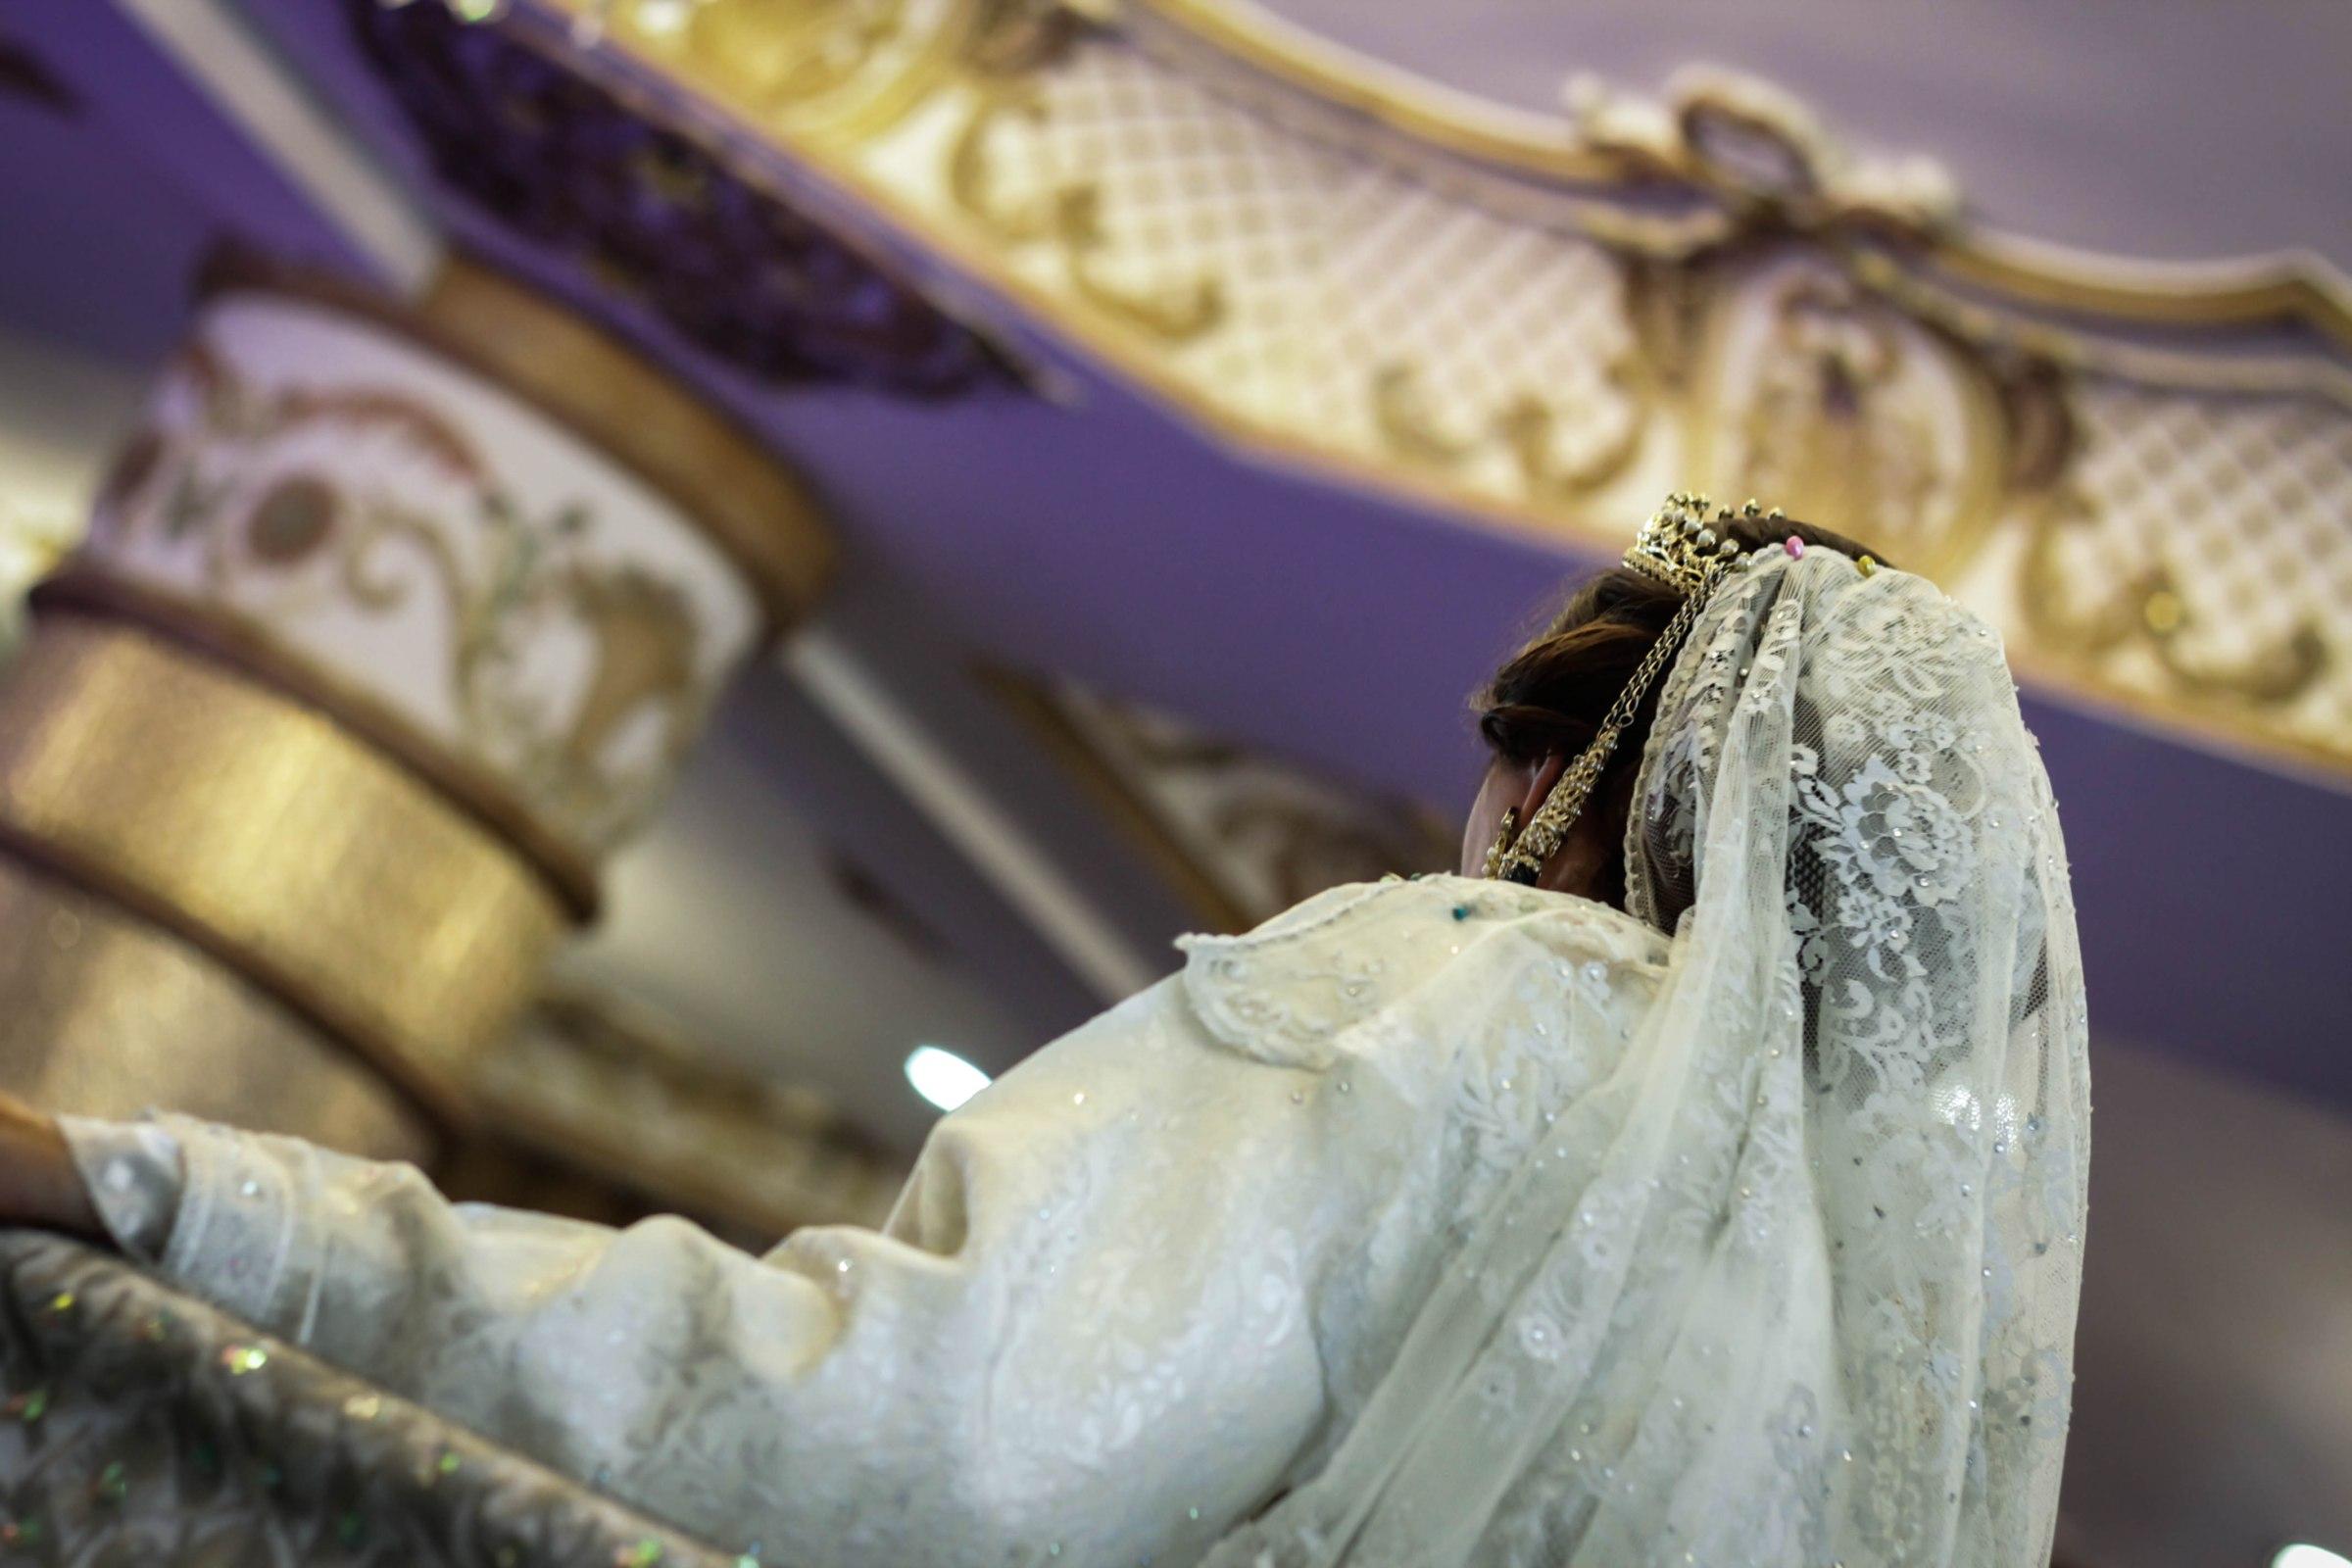 Mariage traditionnel marocain à Casablanca